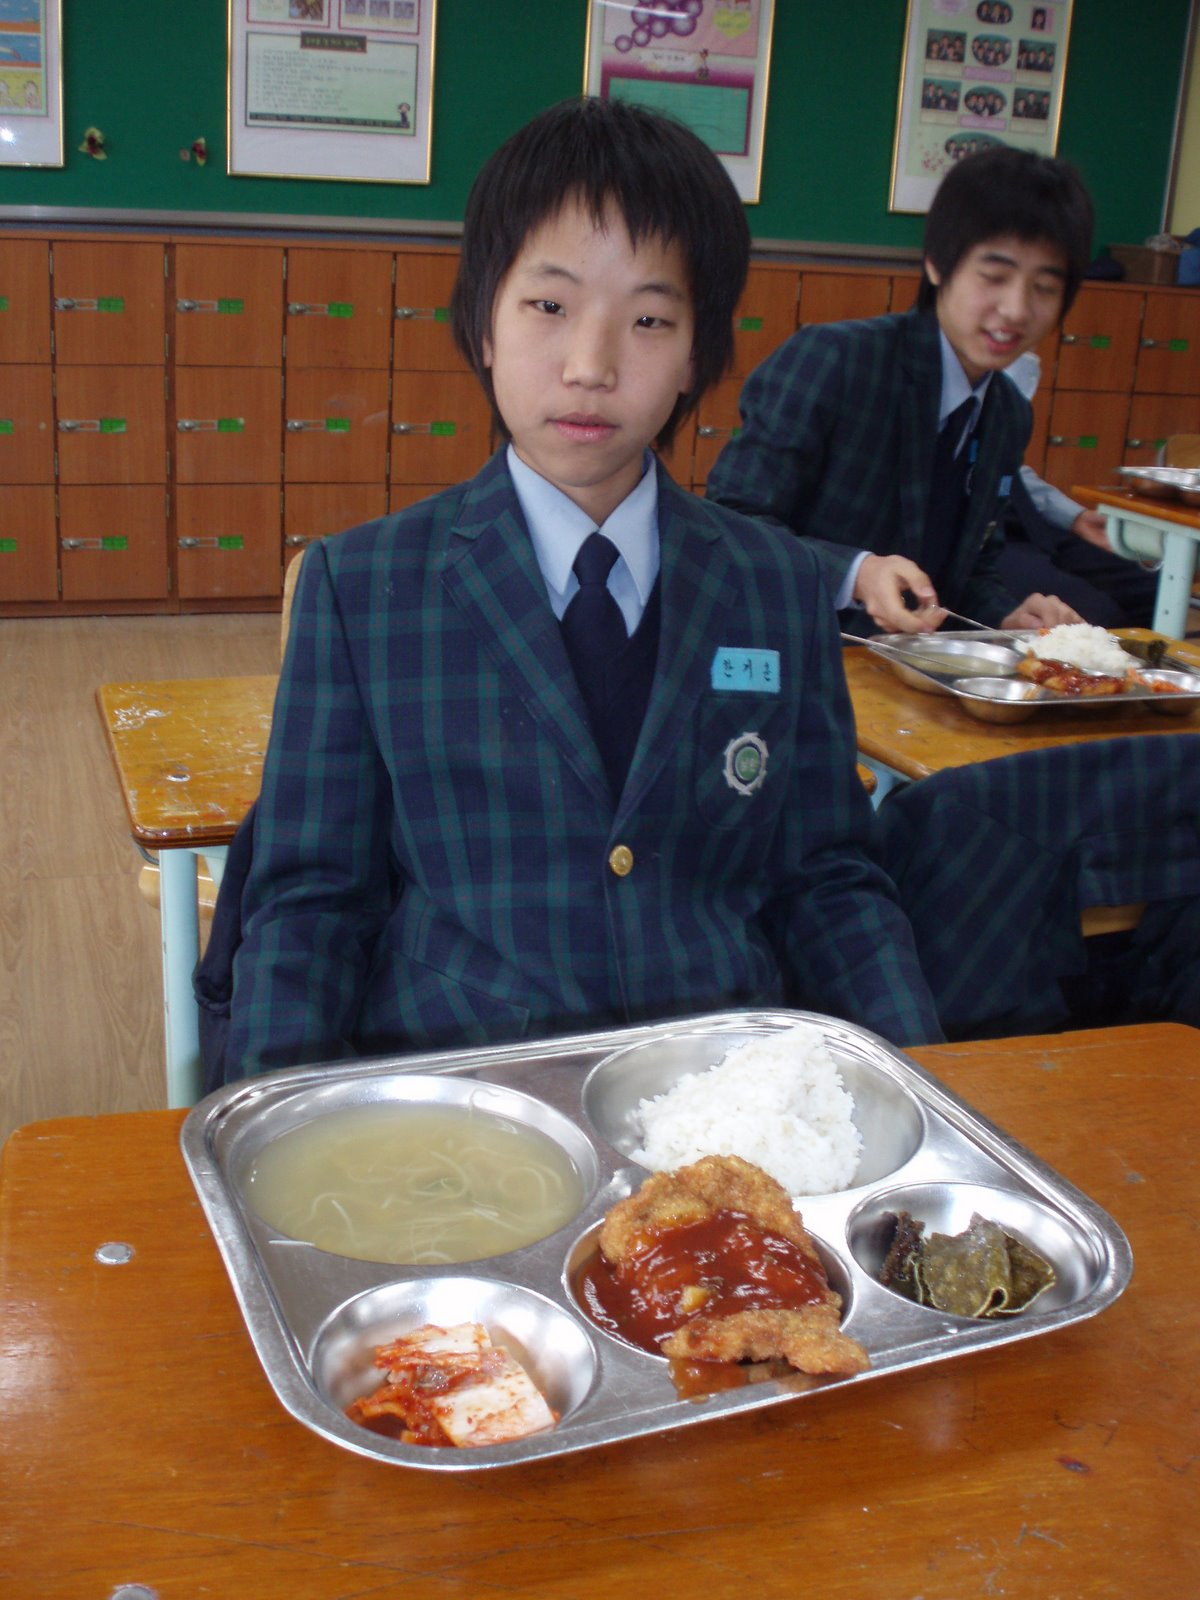 feeding hungry kids in korean schools teaching the teacher